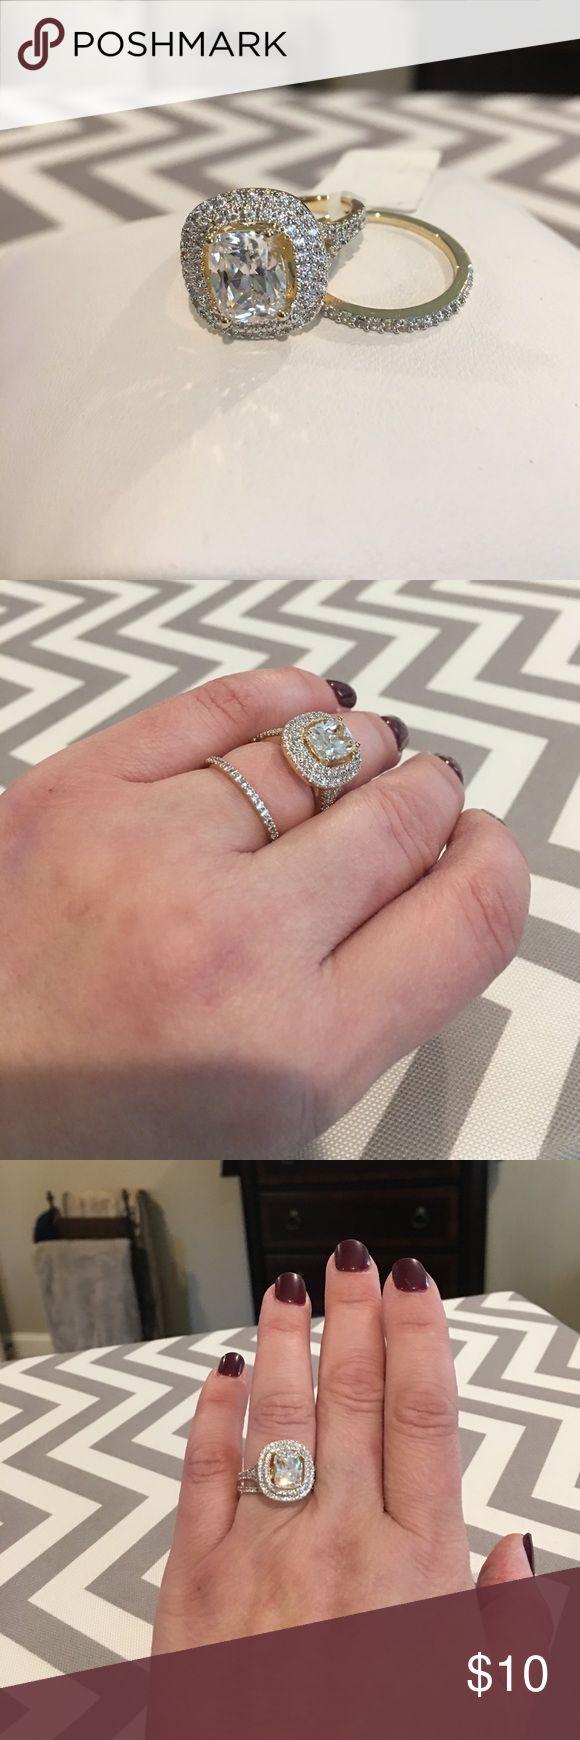 CZ 2 Piece Double Halo Bridal Ring Set CZ 2 piece double halo Bridal ring set in 18k yellow gold plated Jewelry Rings